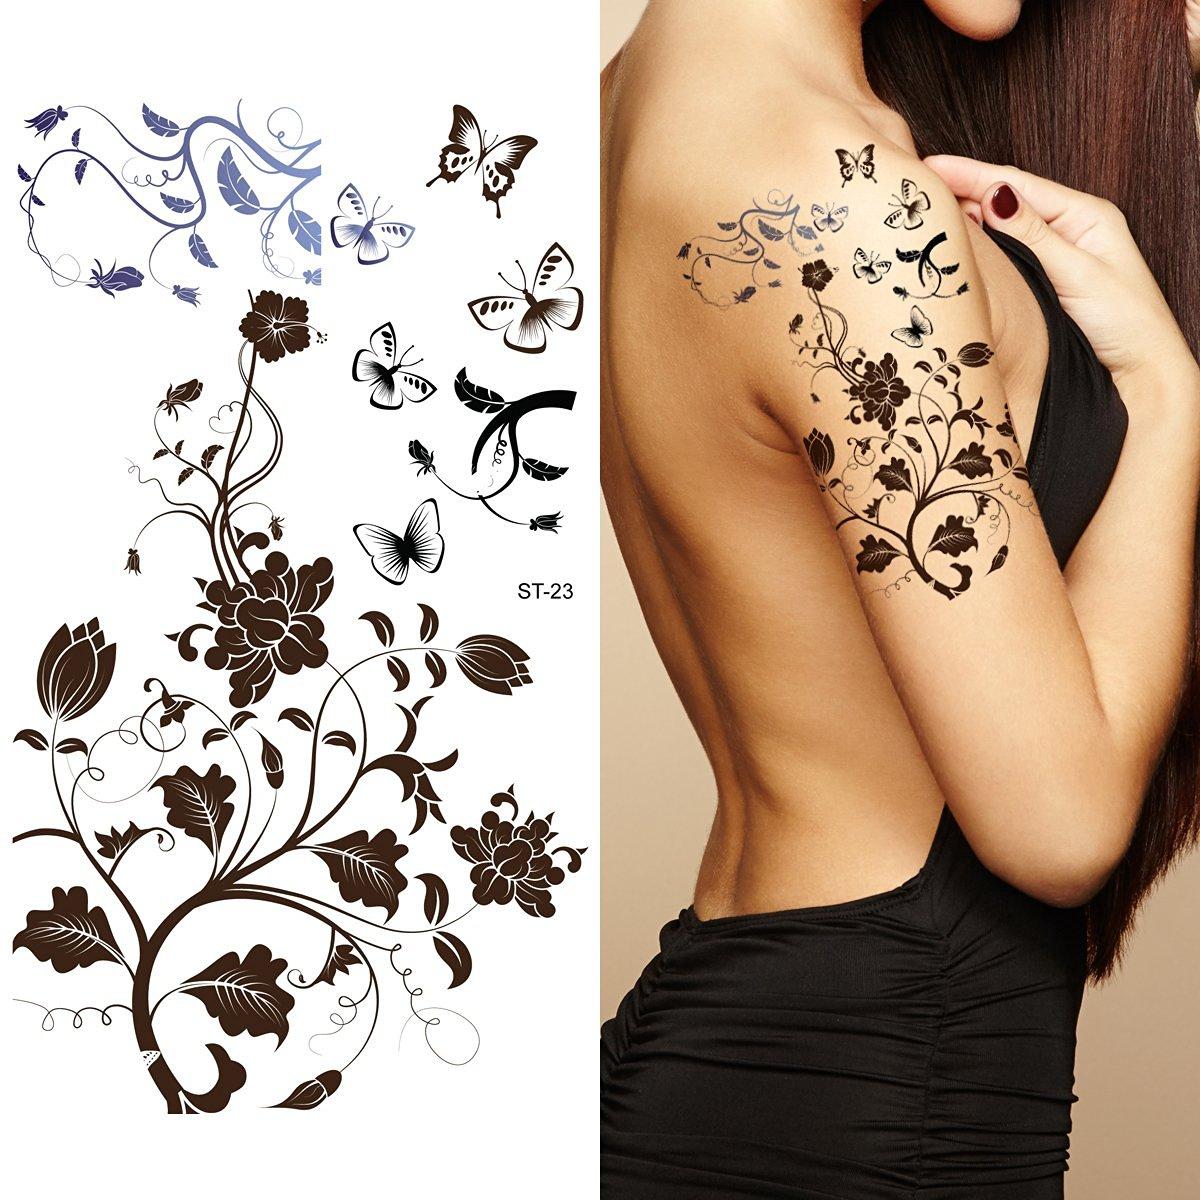 2160da201 Get Quotations · Supperb Temporary Tattoos - Black Tribal Fall Flower  Tattoos